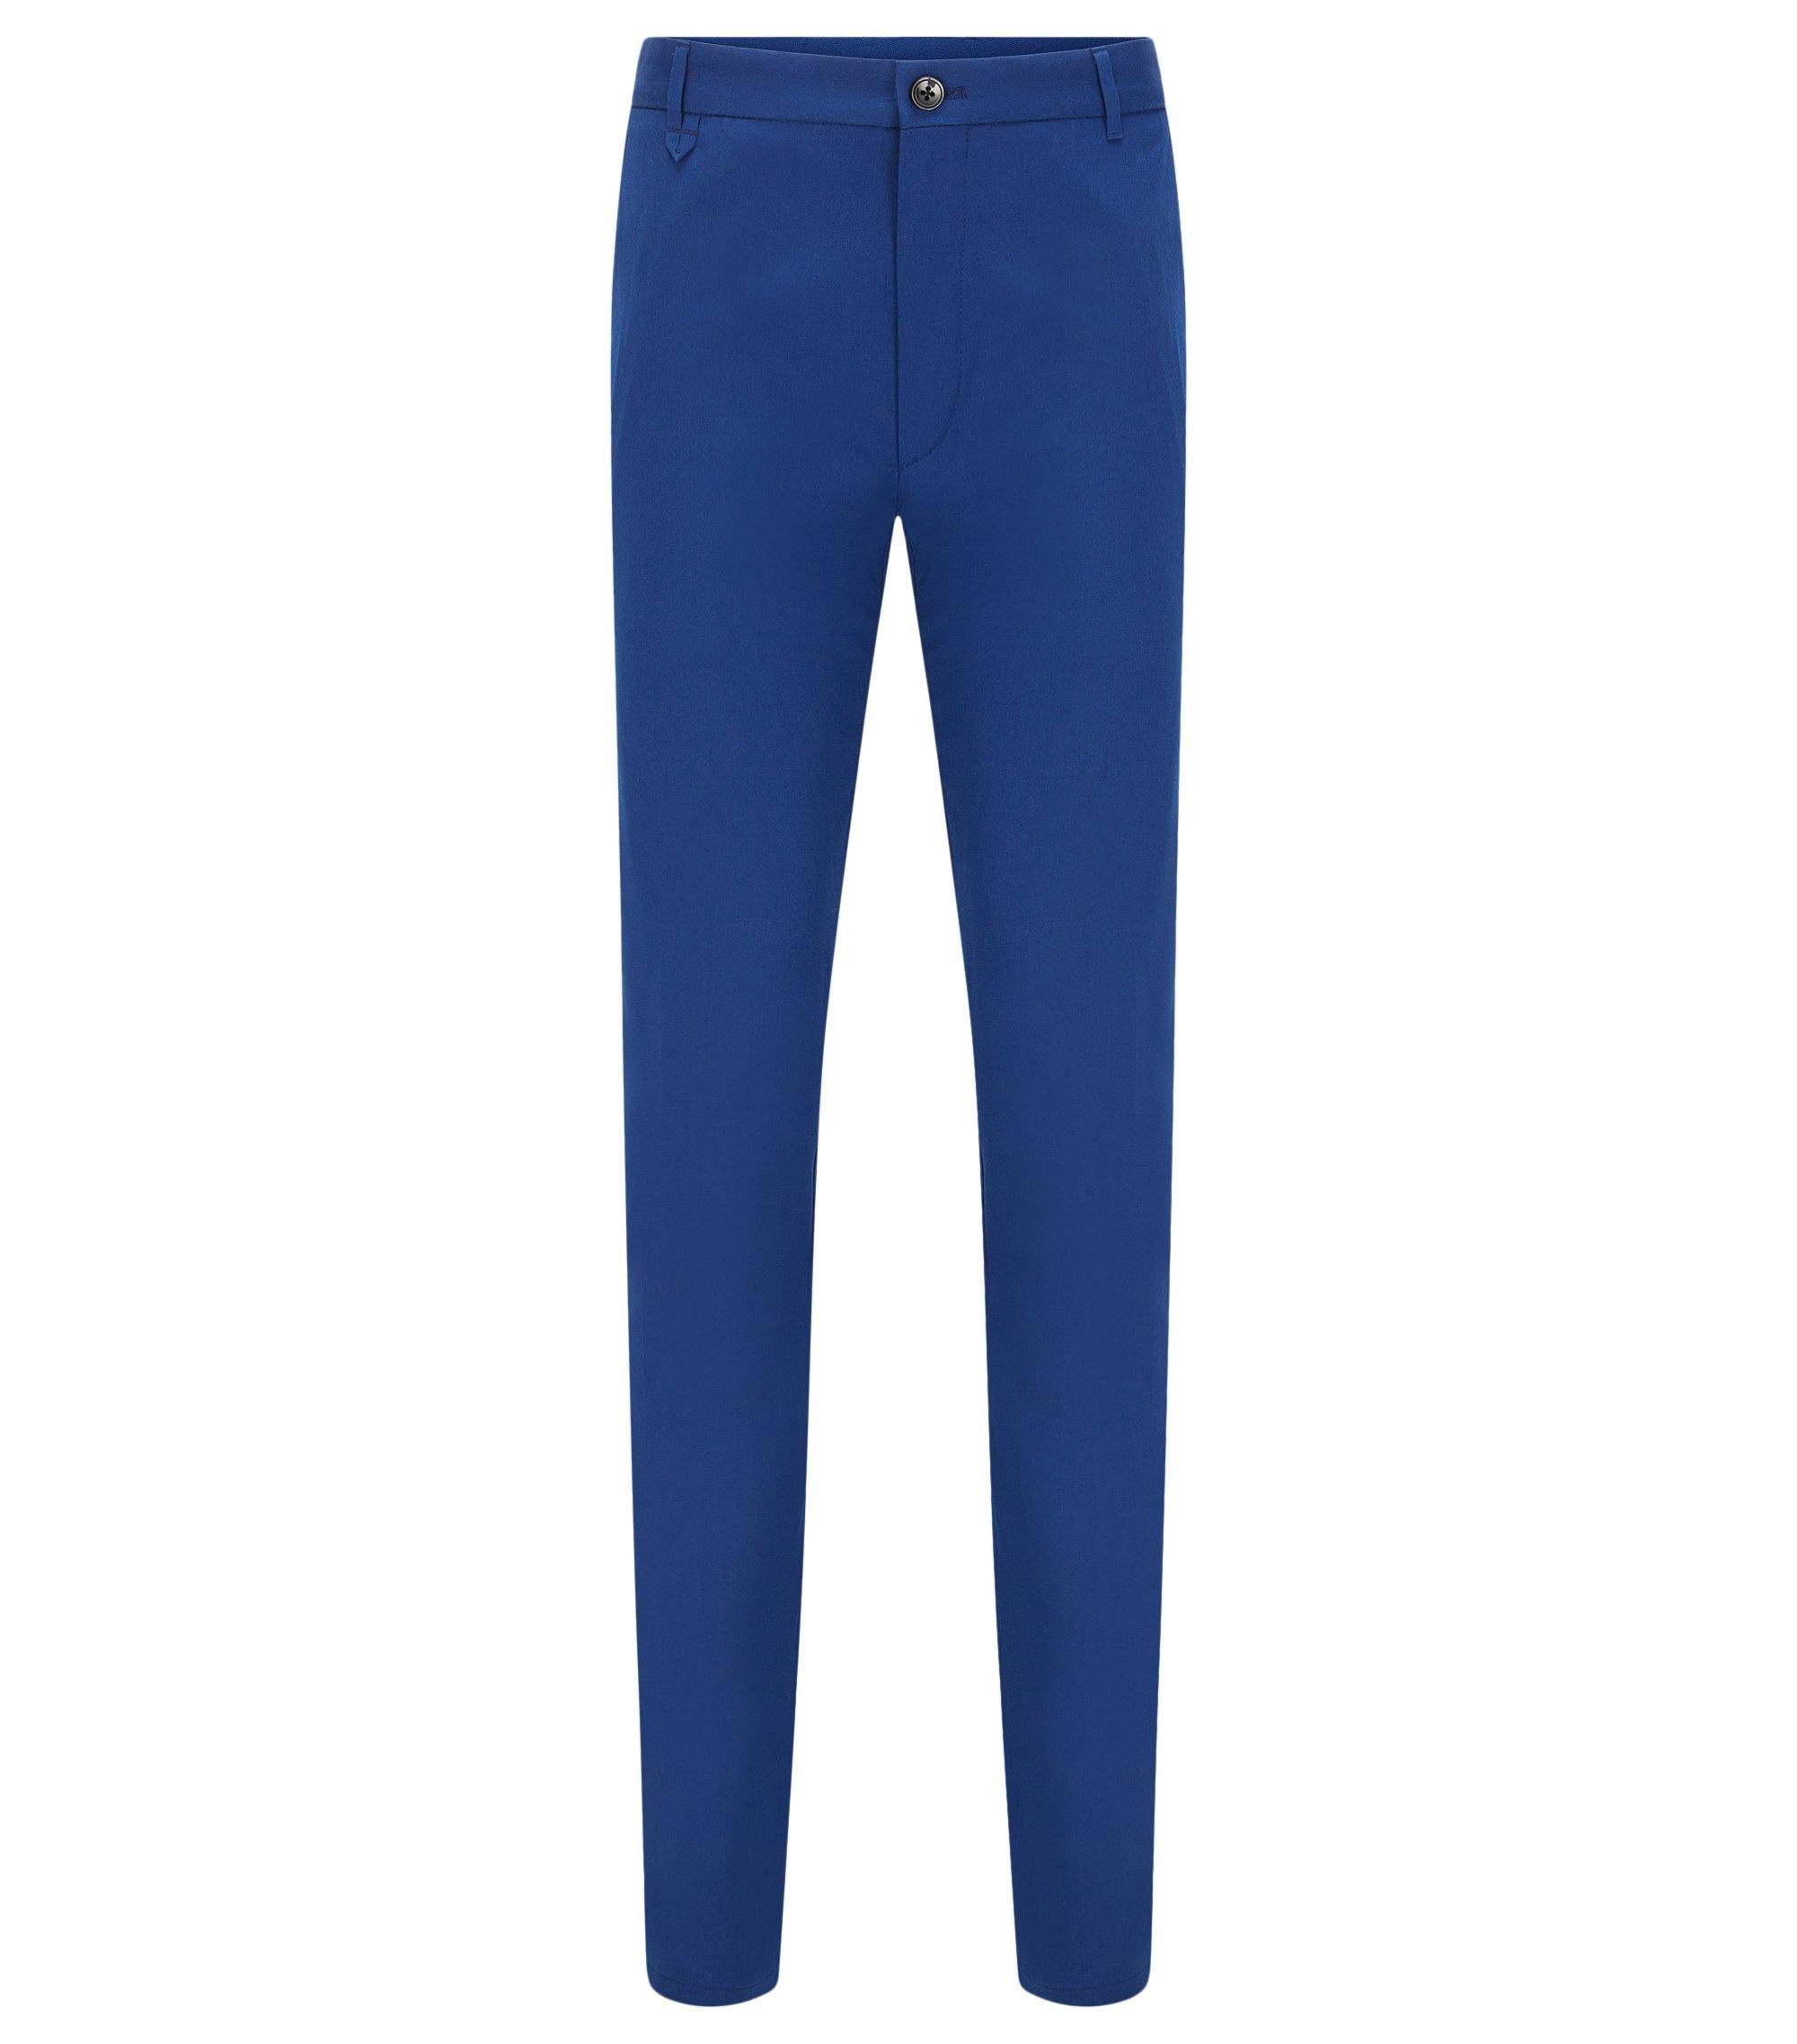 Stretch Cotton Pants, Extra Slim Fit   Heldor, Blue